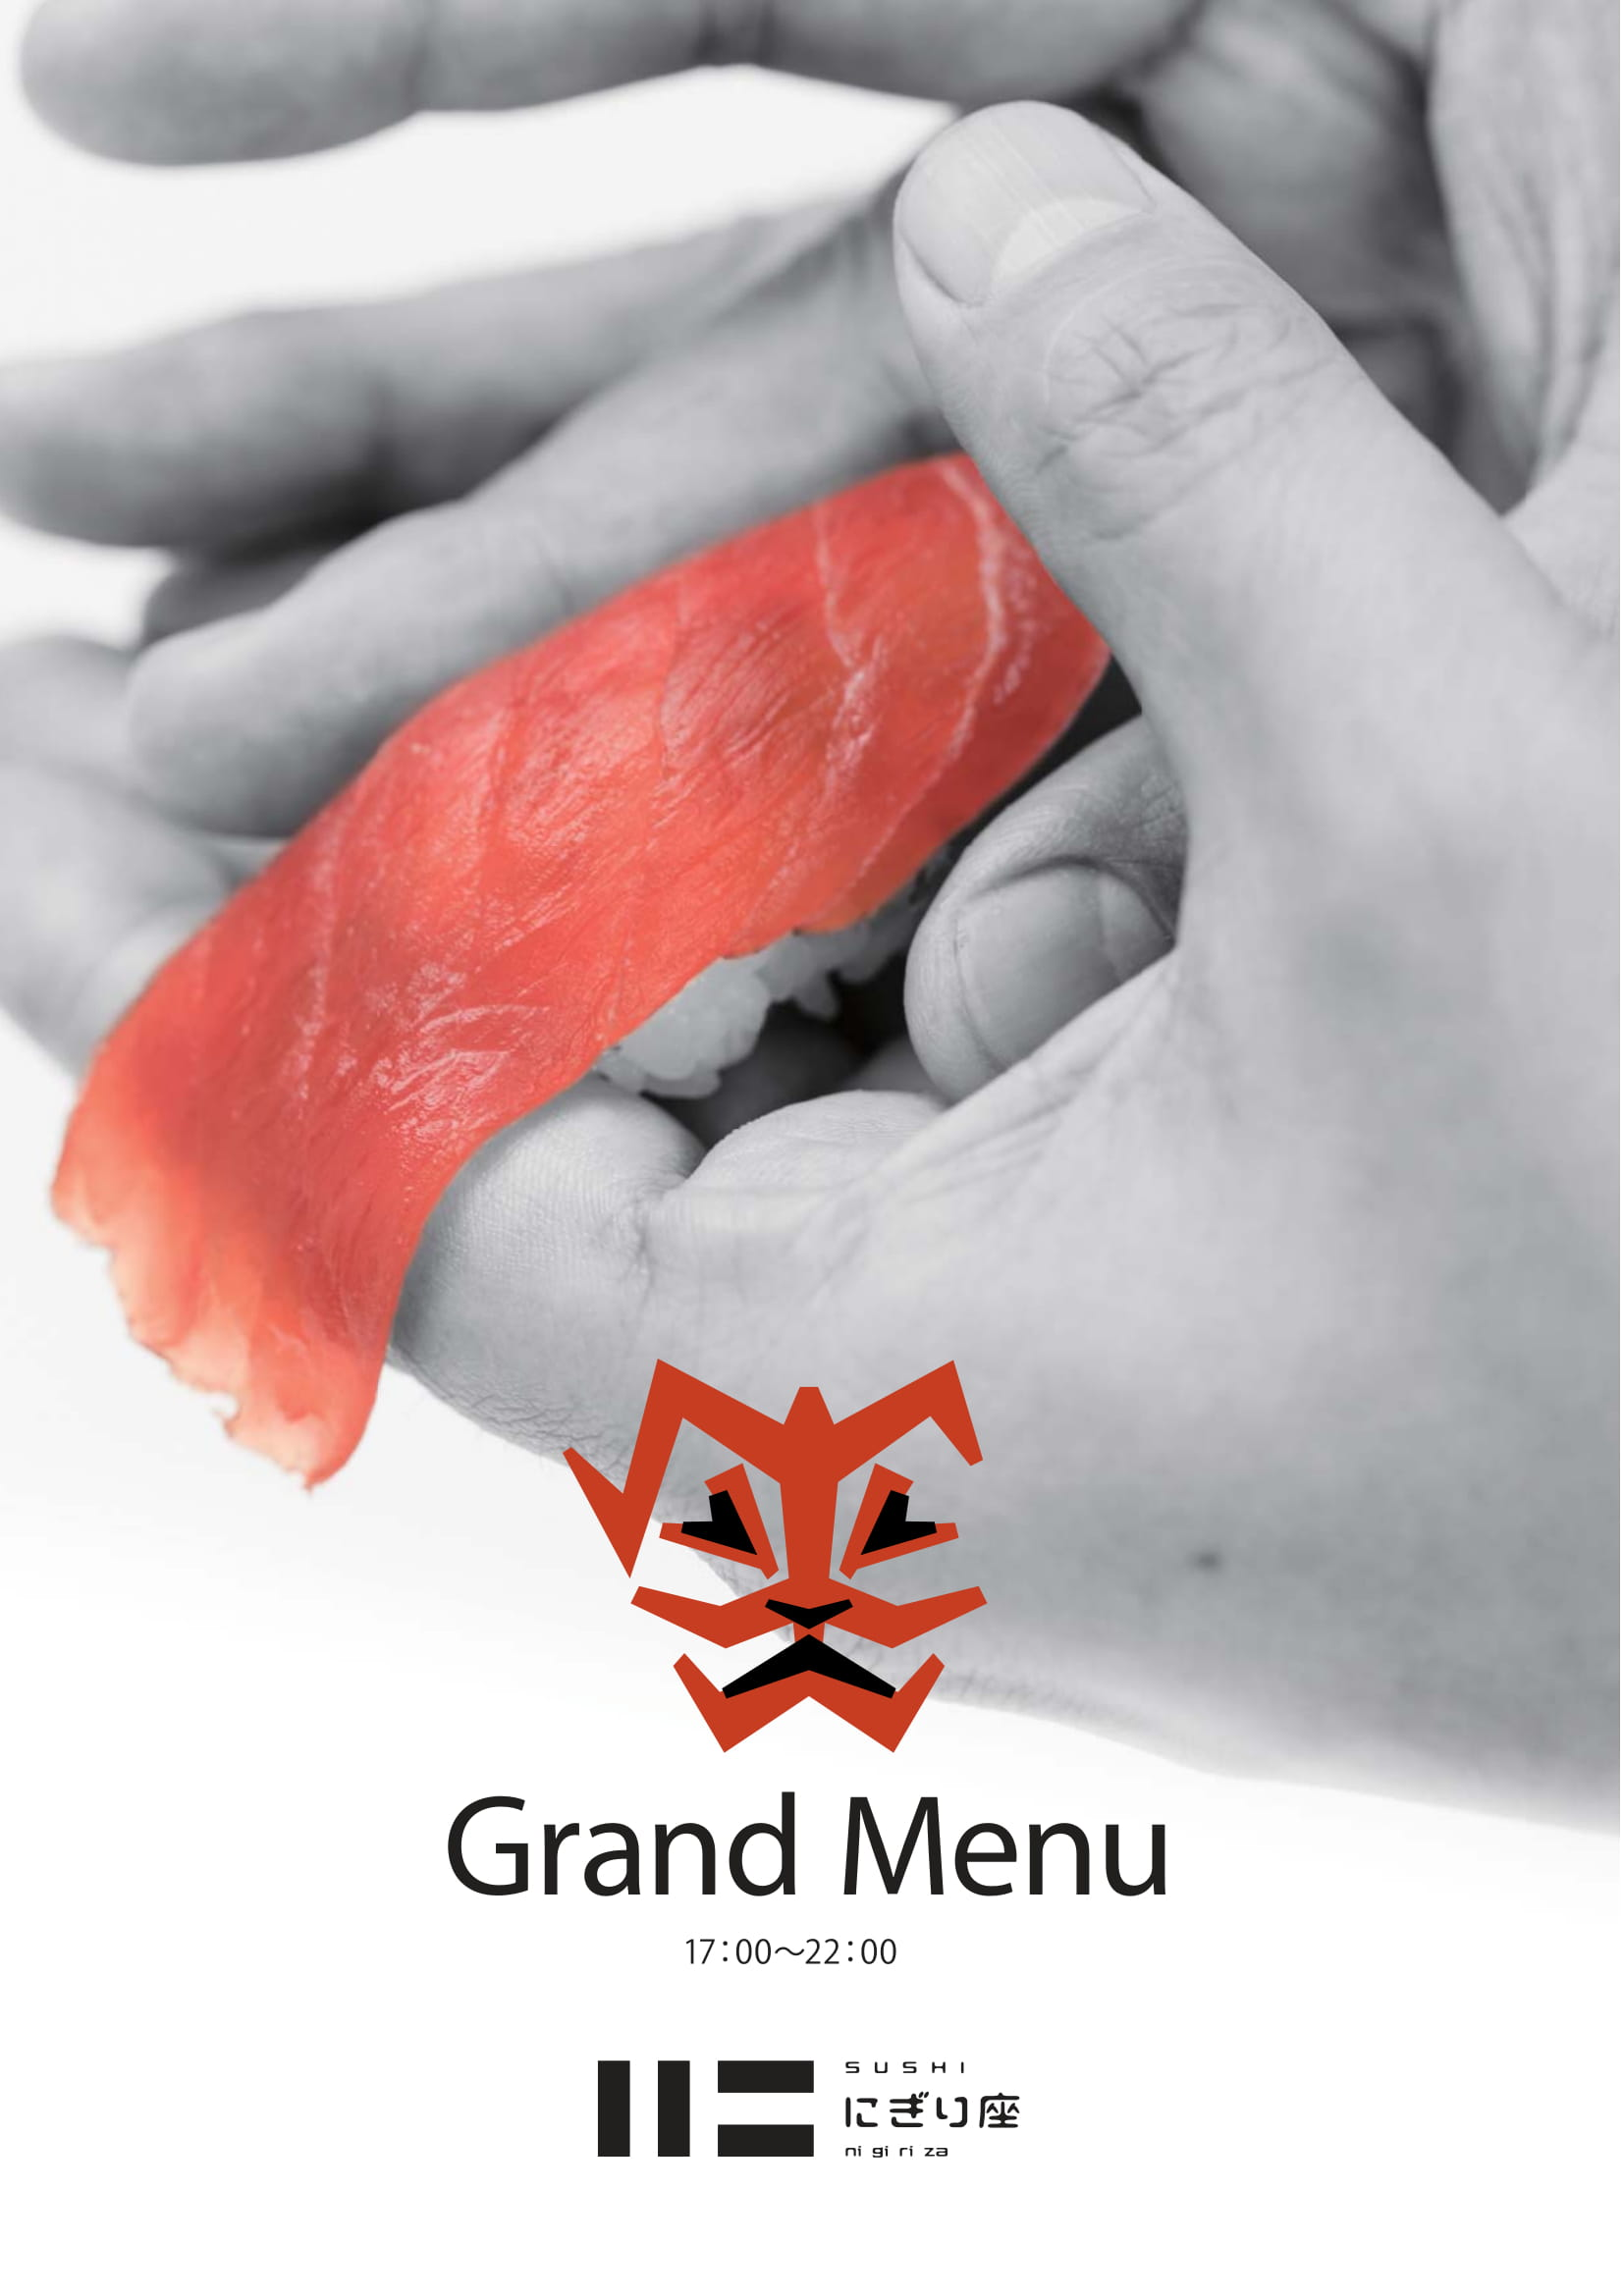 180221_nigiriza_menu_03_grand_1-1.jpg